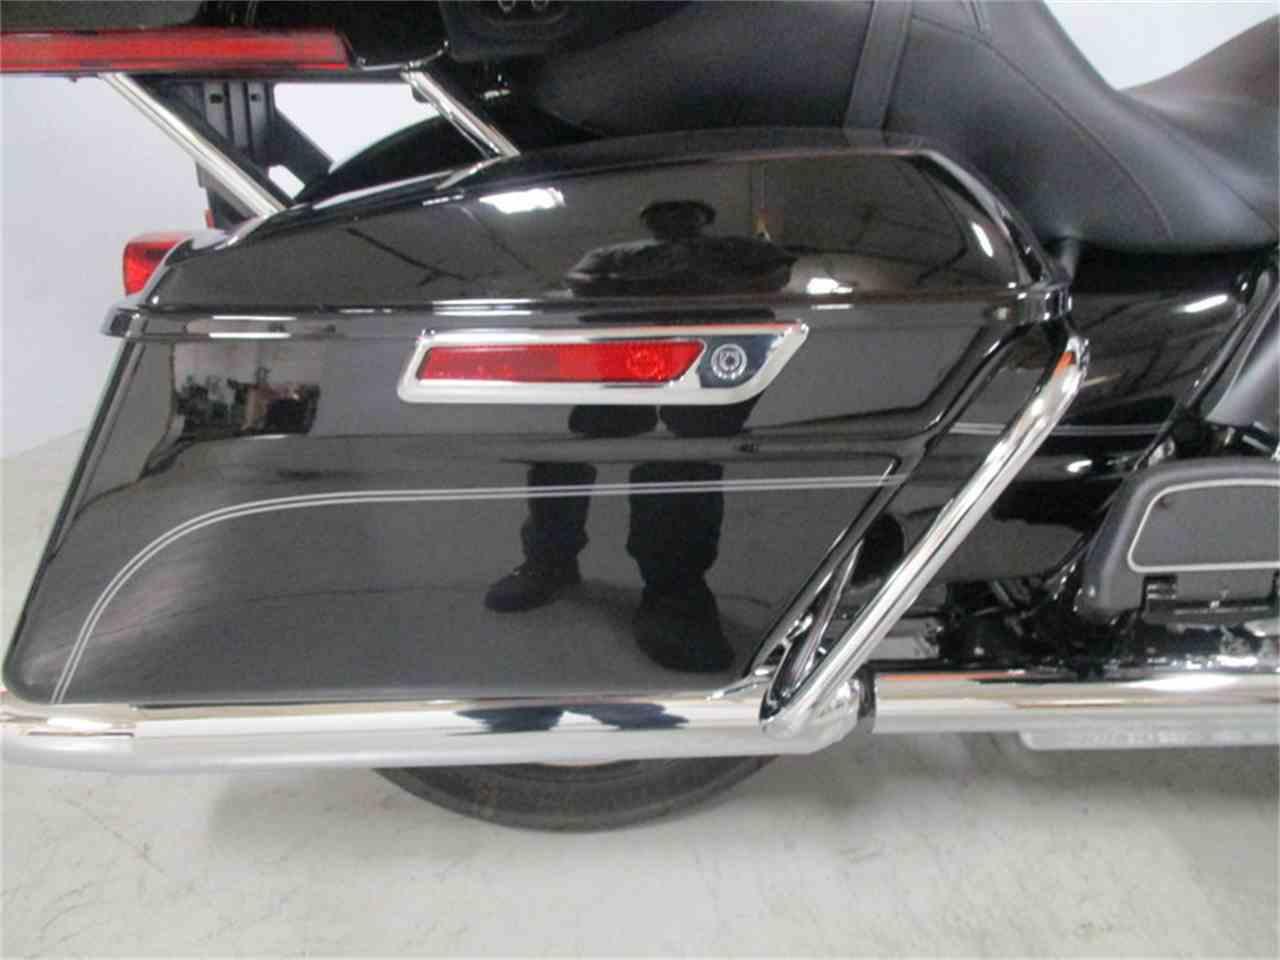 Large Picture of '16 FLHTCU - Electra Glide® Ultra Classic® - M9DY